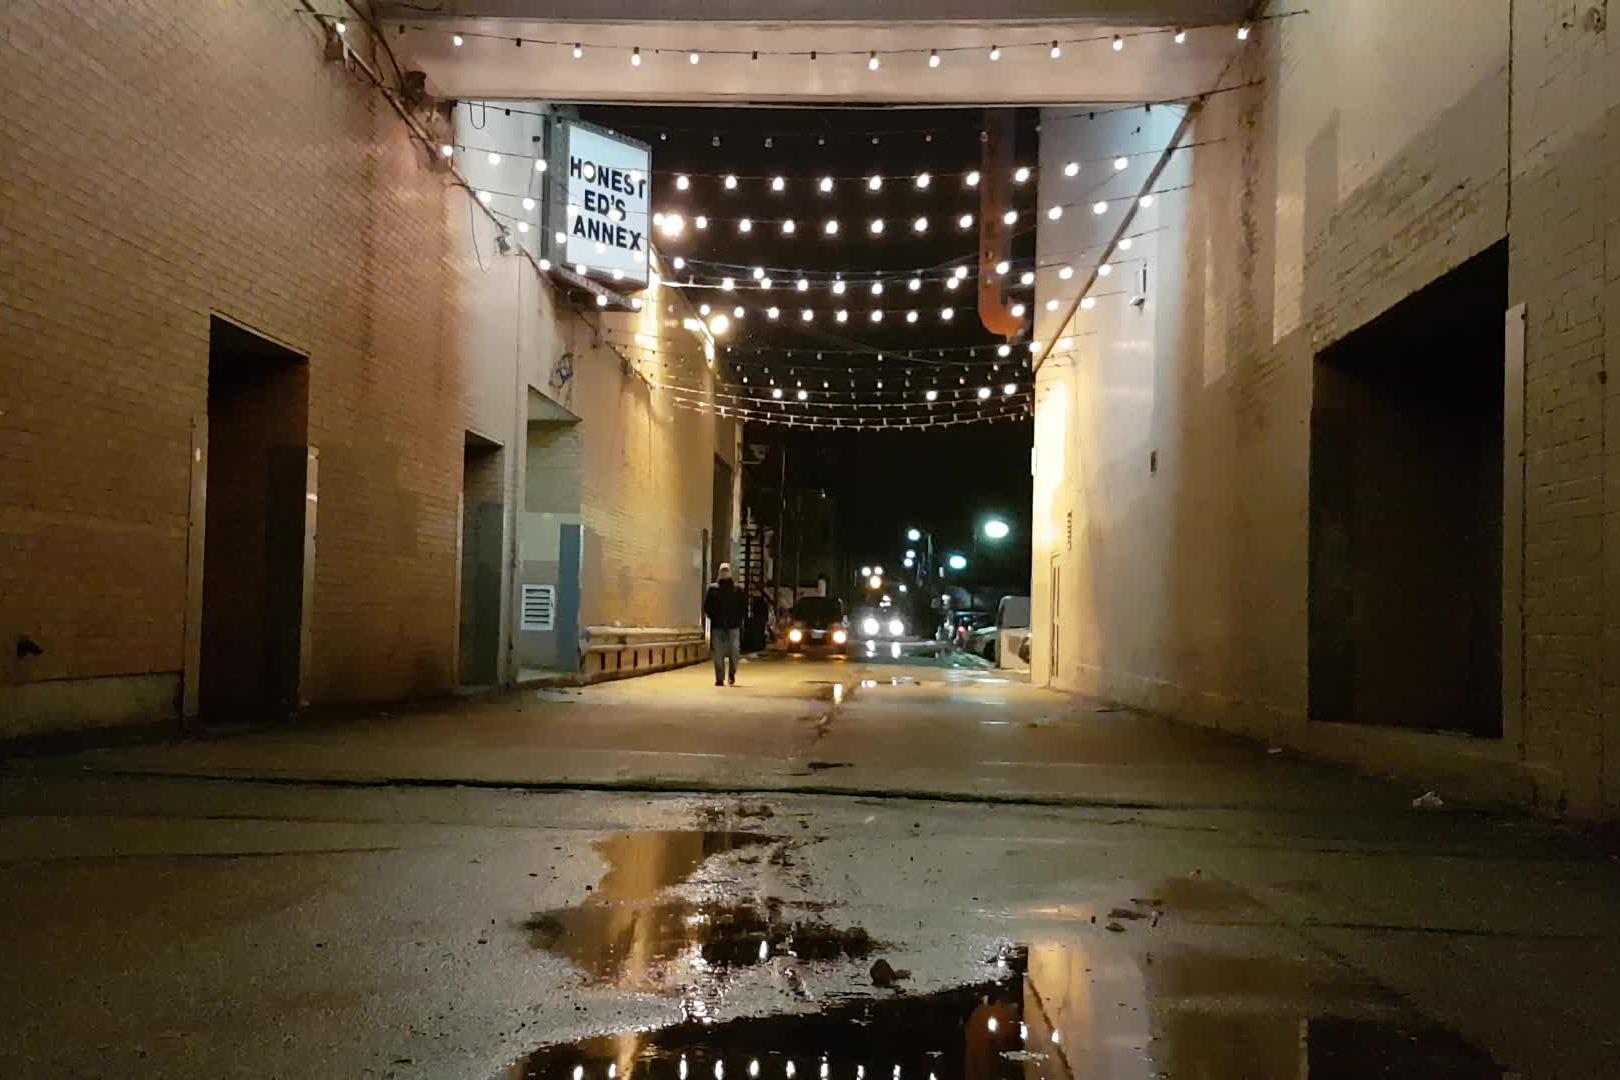 honest eds alley lights_mailchimp crop.jpg